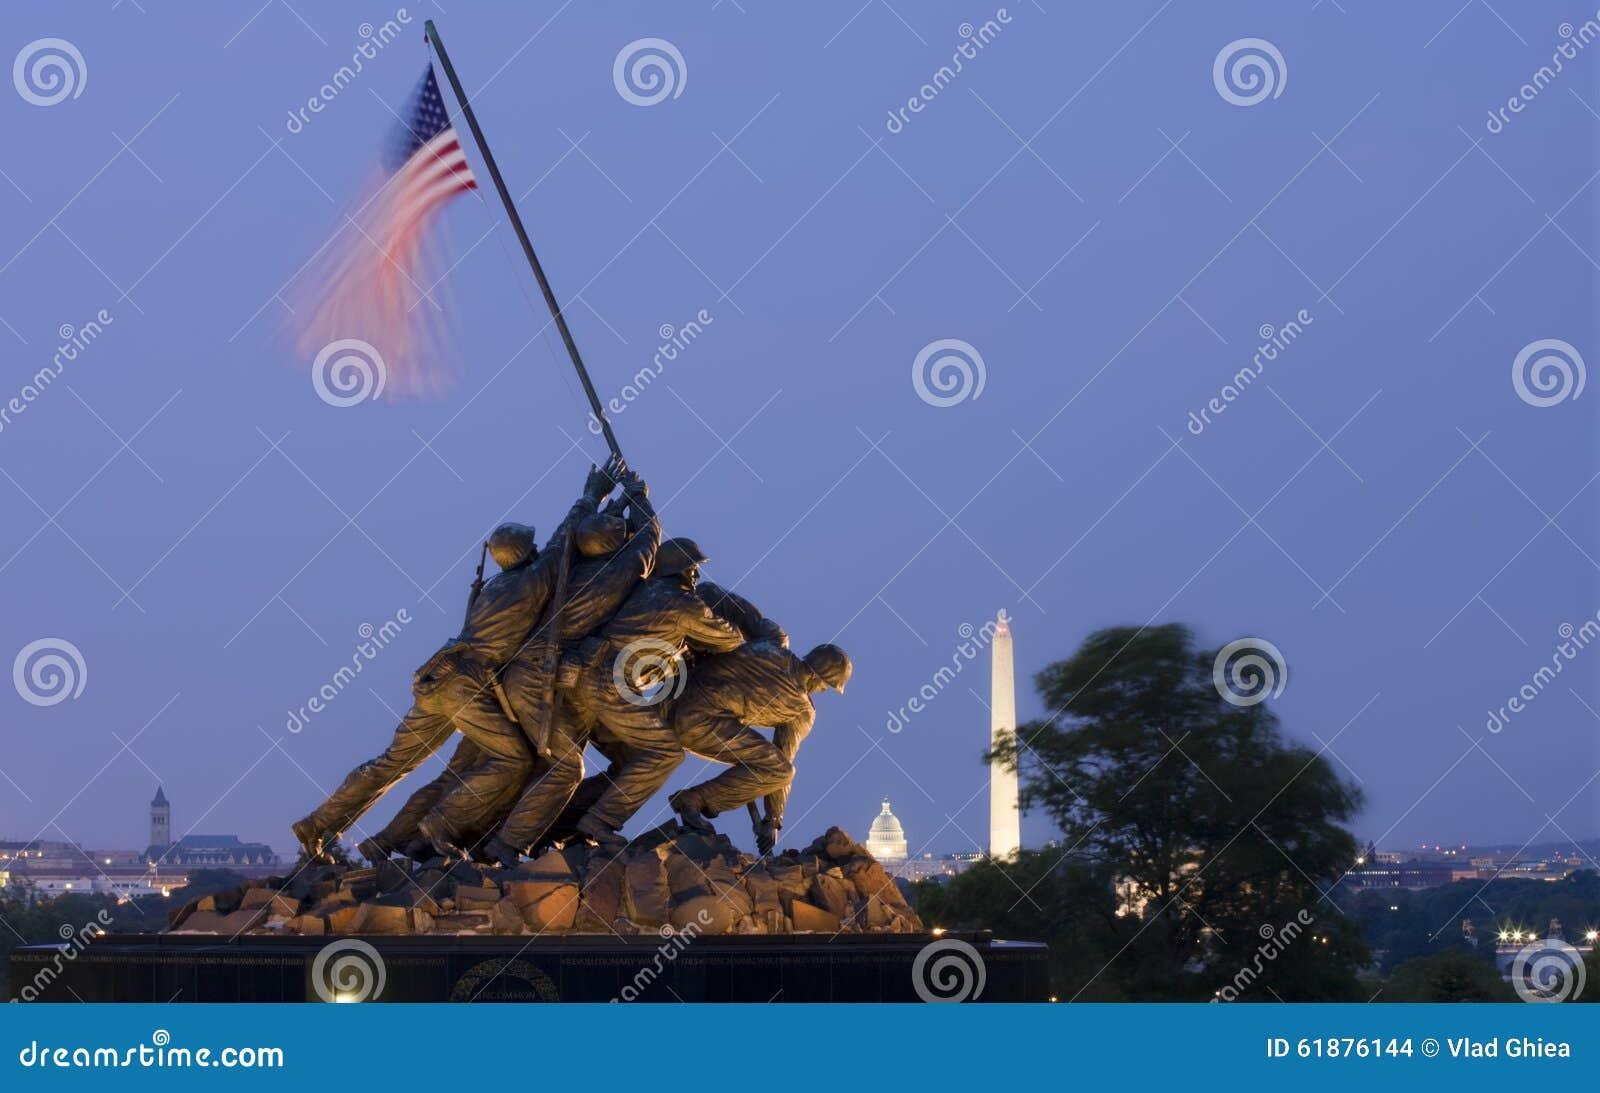 Iwo Jima pomnik w washington dc, usa